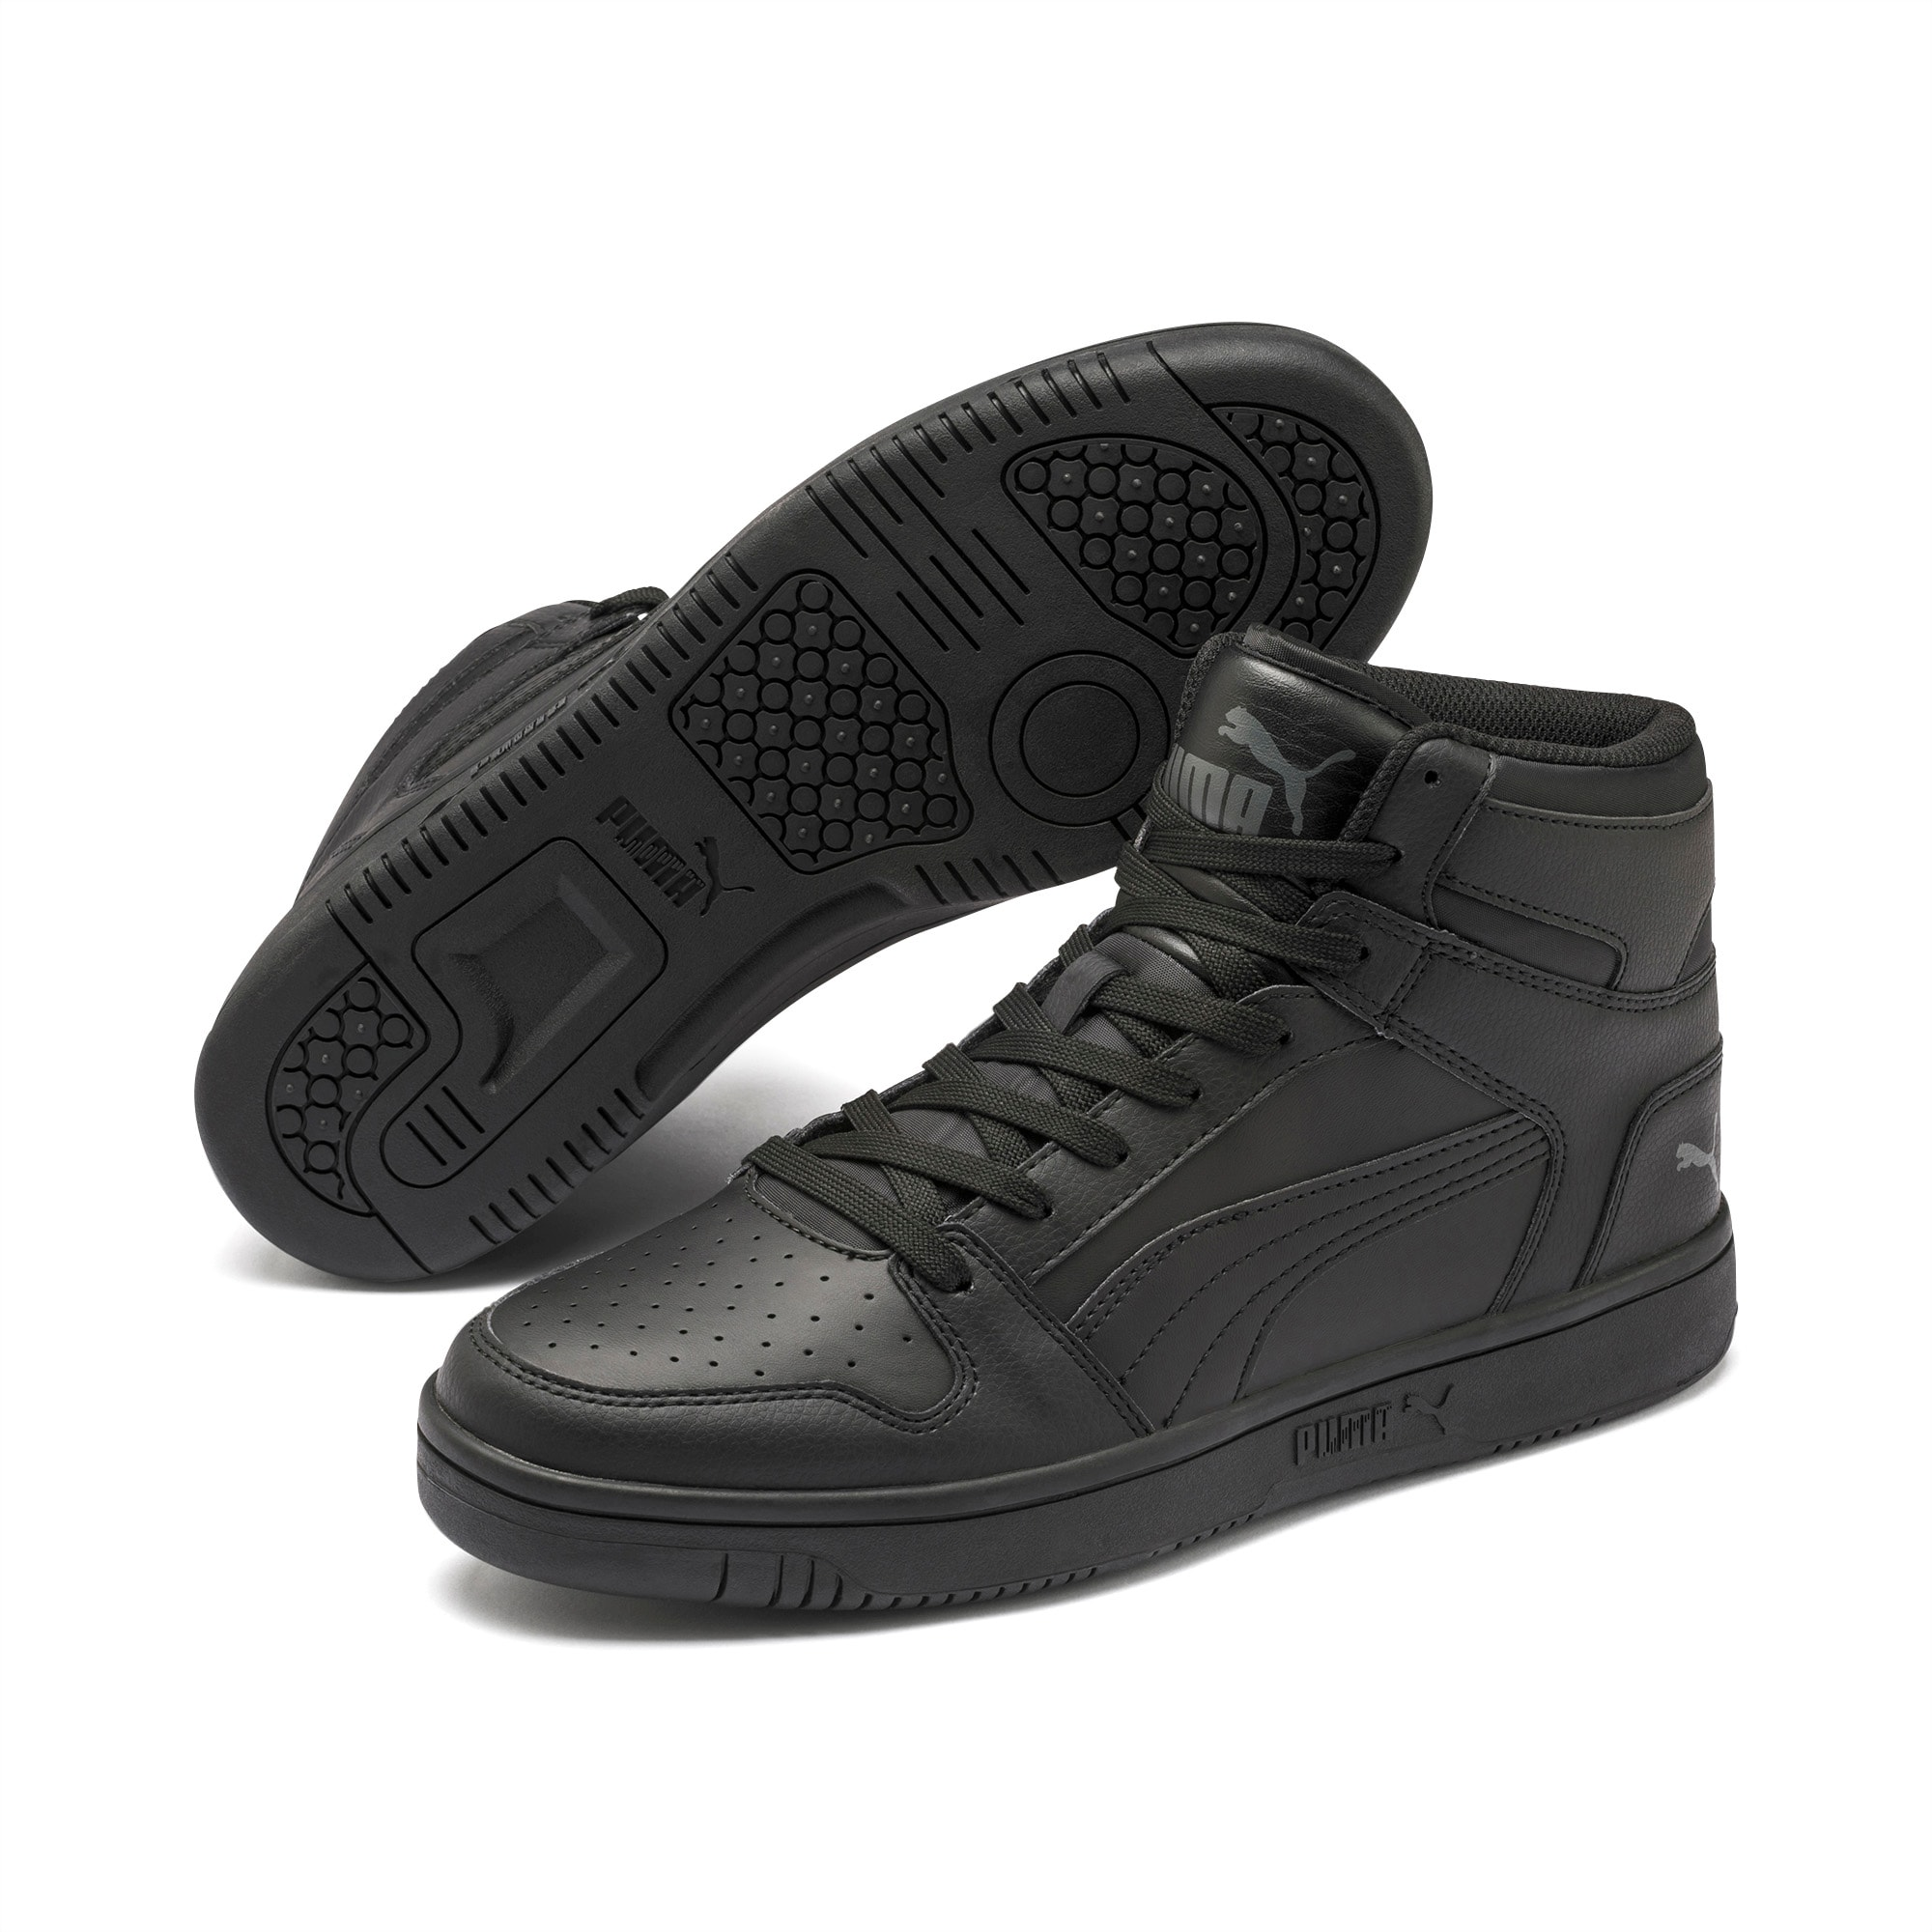 Puma Rebound sneakers black dark shadow